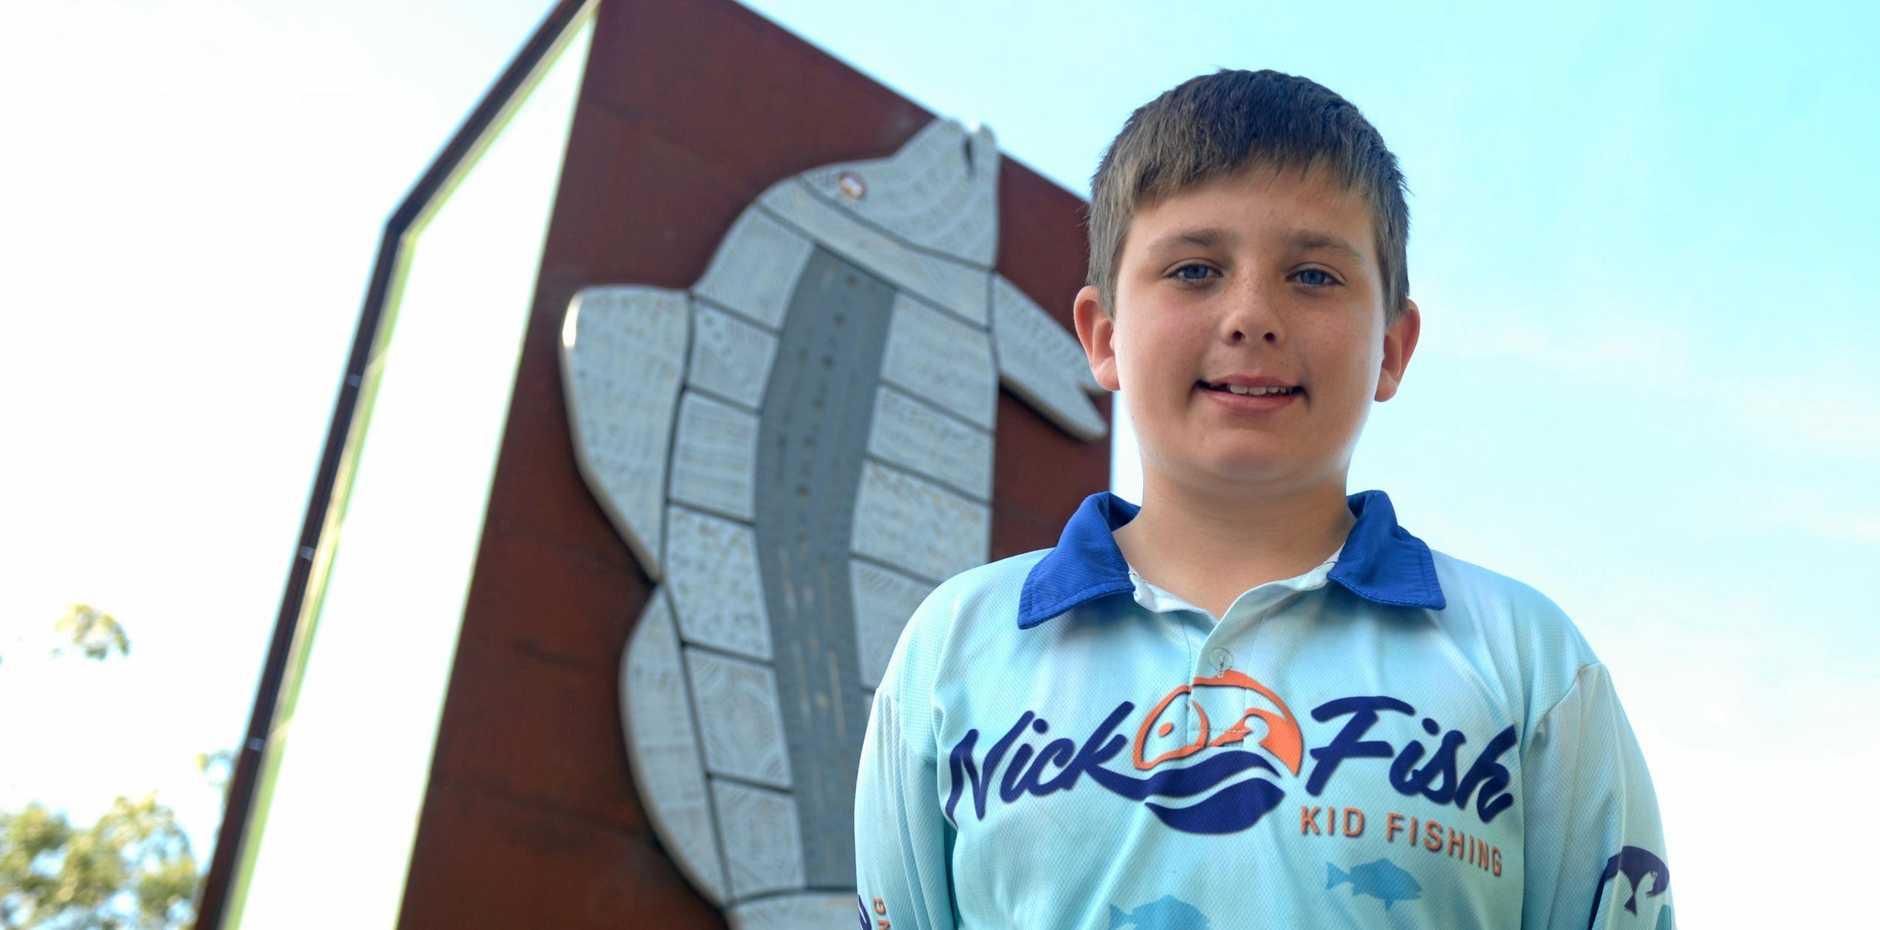 Nick Thompson is Rockhampton's fast rising fishing star